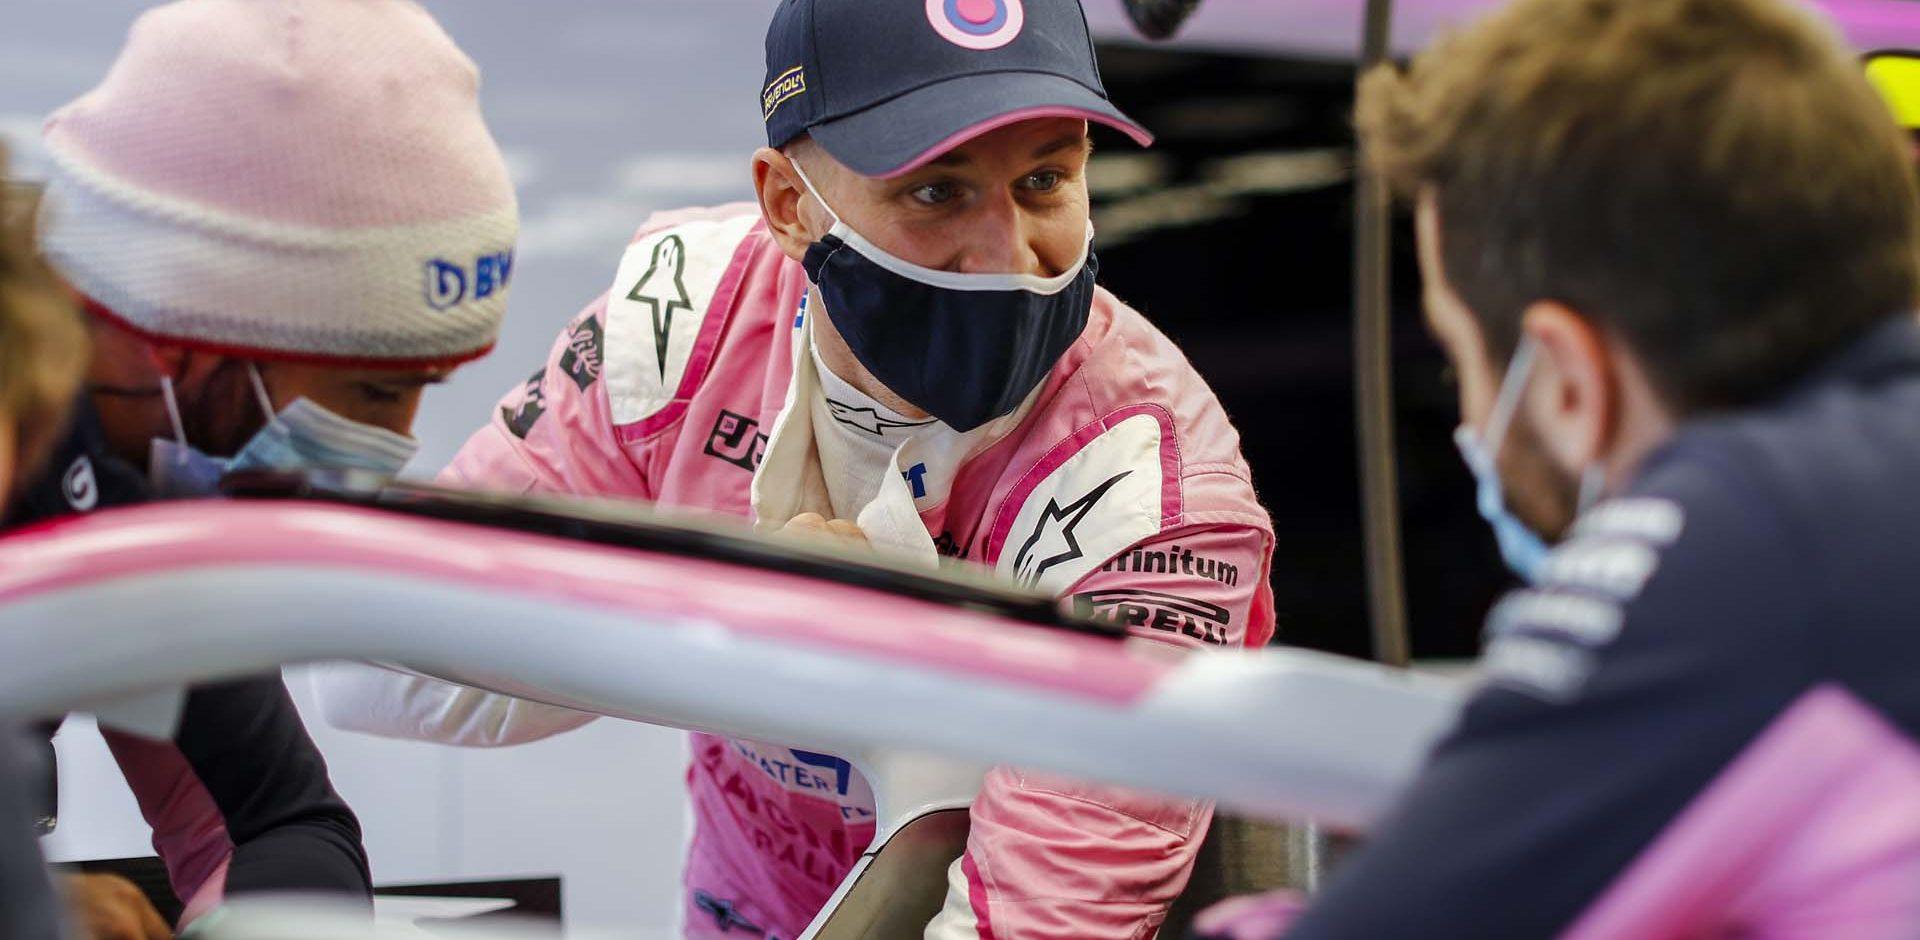 Nico Hülkenberg, Racing Point, with his mechanics